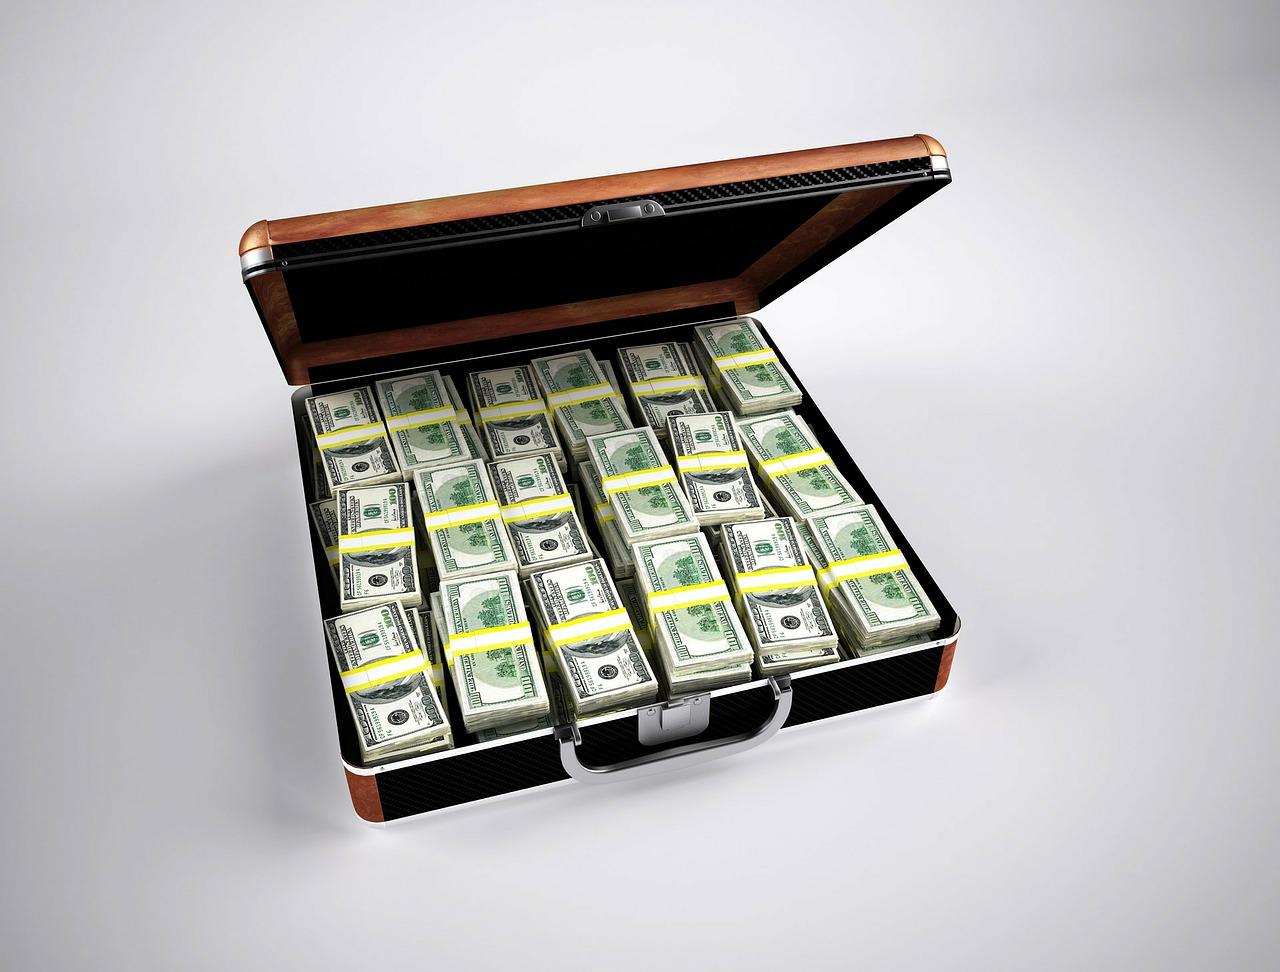 NBU liberalizuvav pravyla povernennja inozemnyh investycij